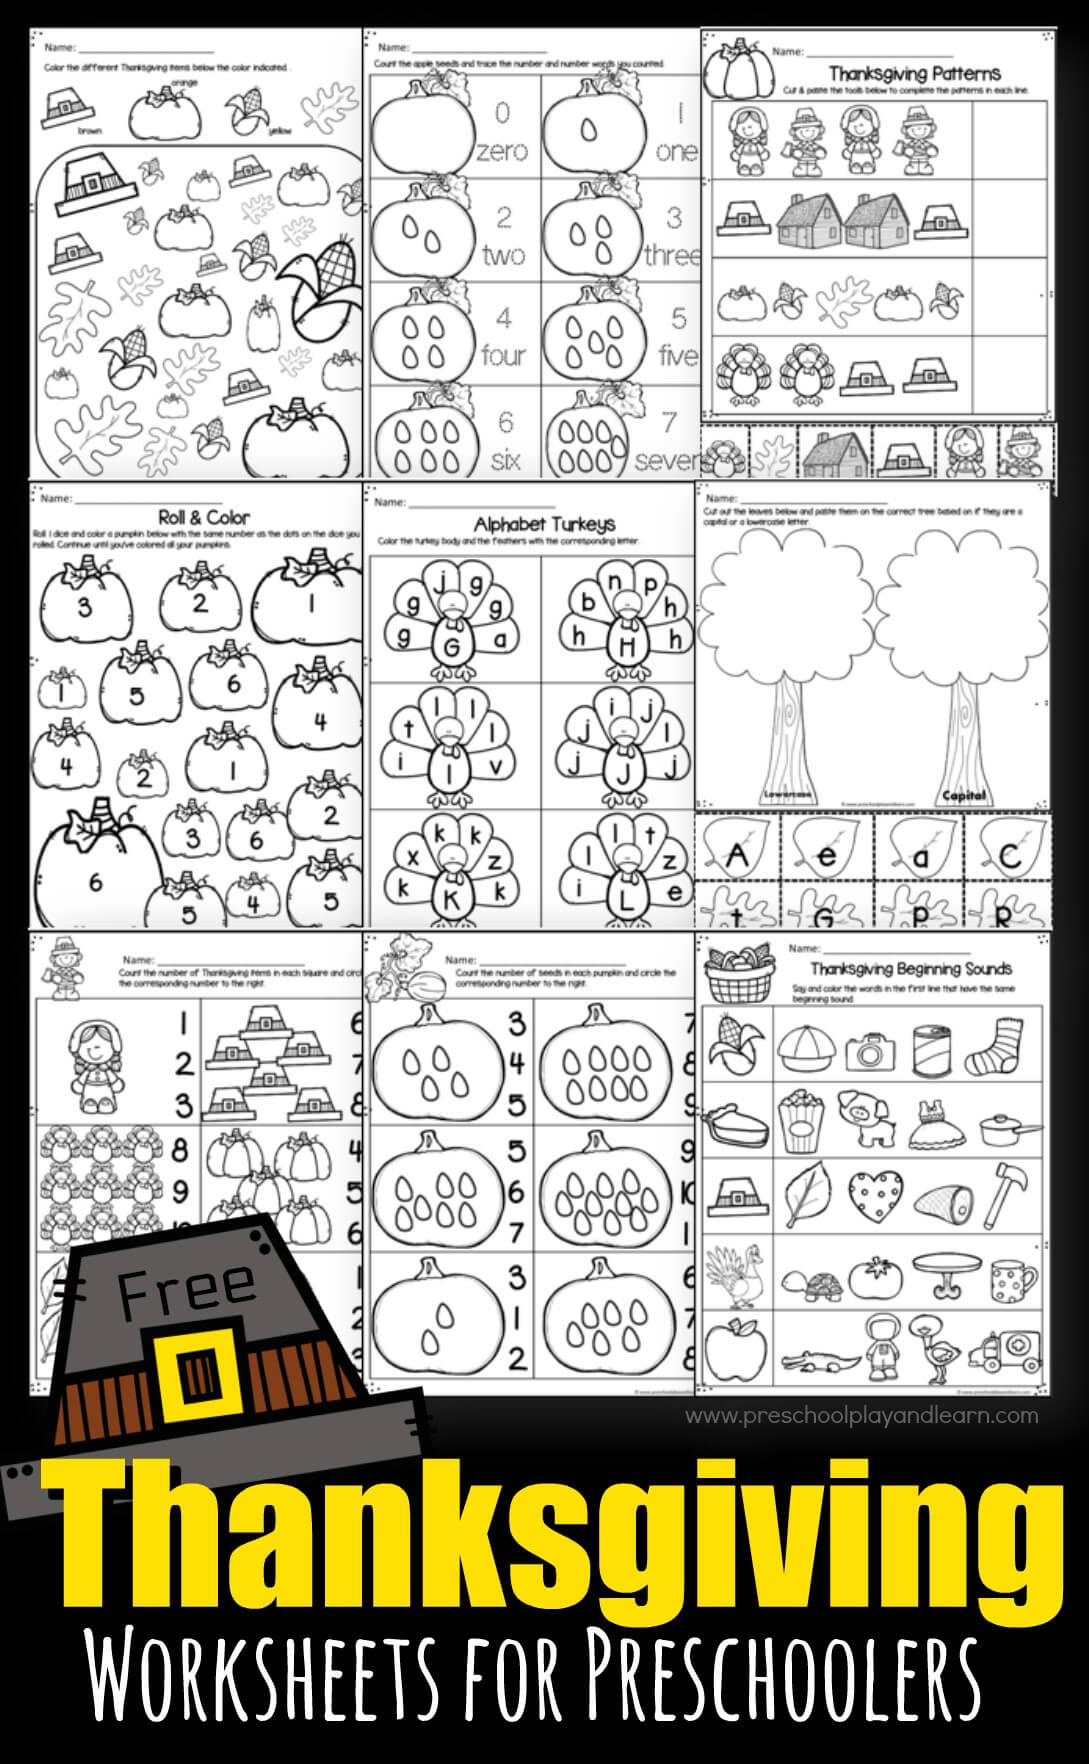 Thanksgiving Worksheets For Preschoolers